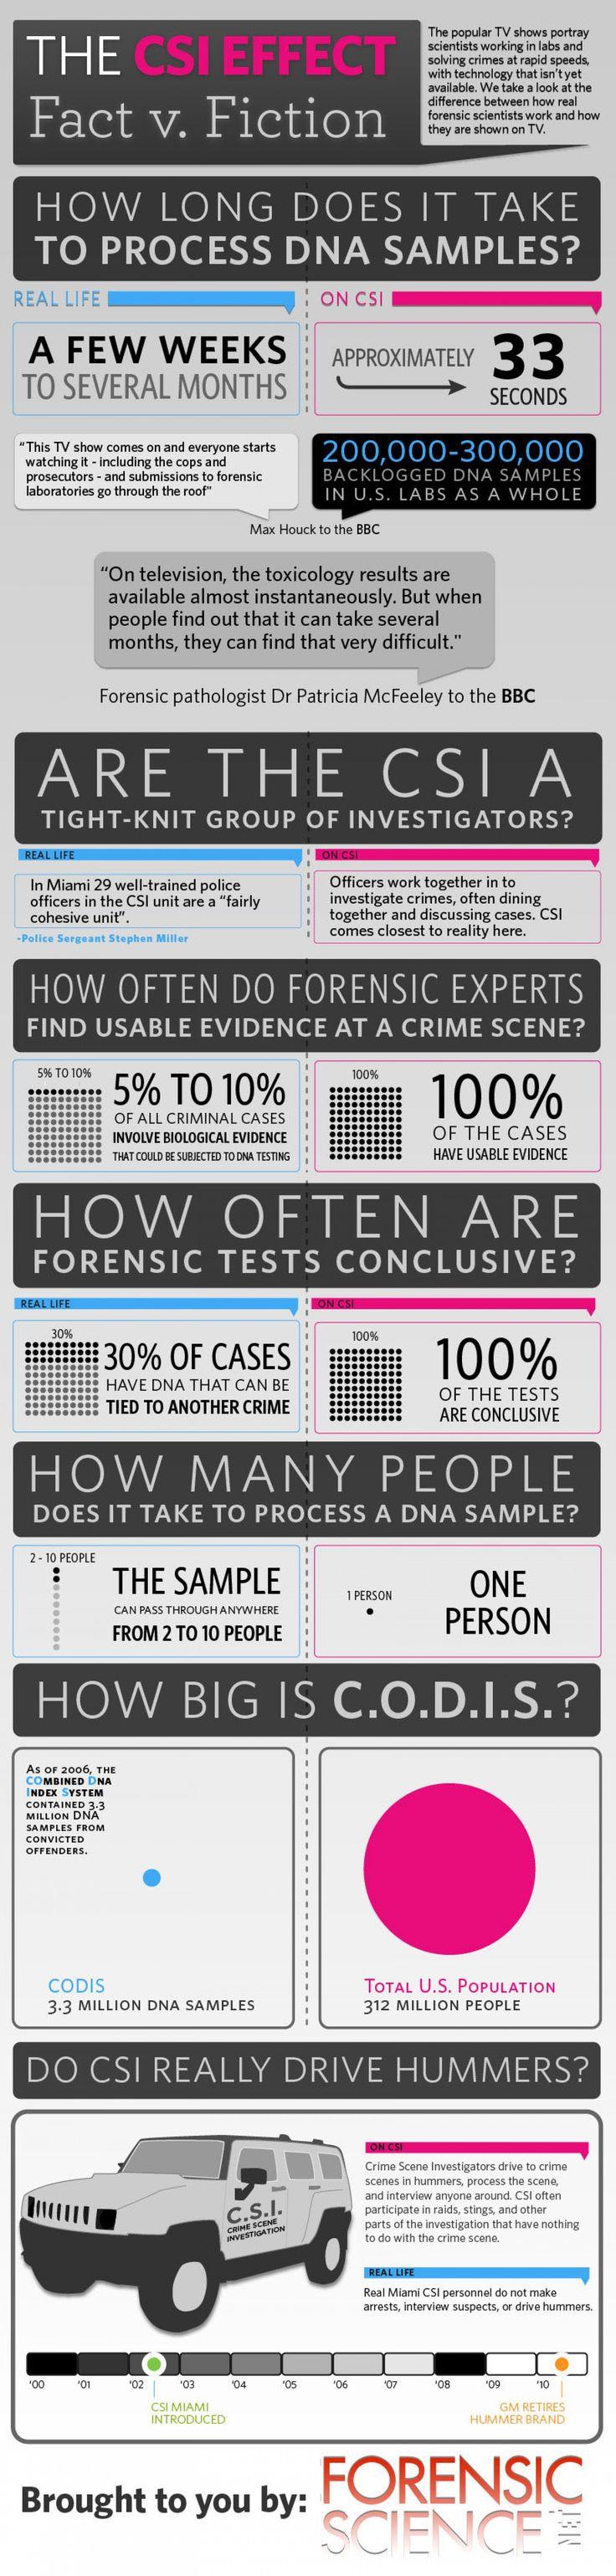 The CSI Effect: Fact vs. Fiction Infographic